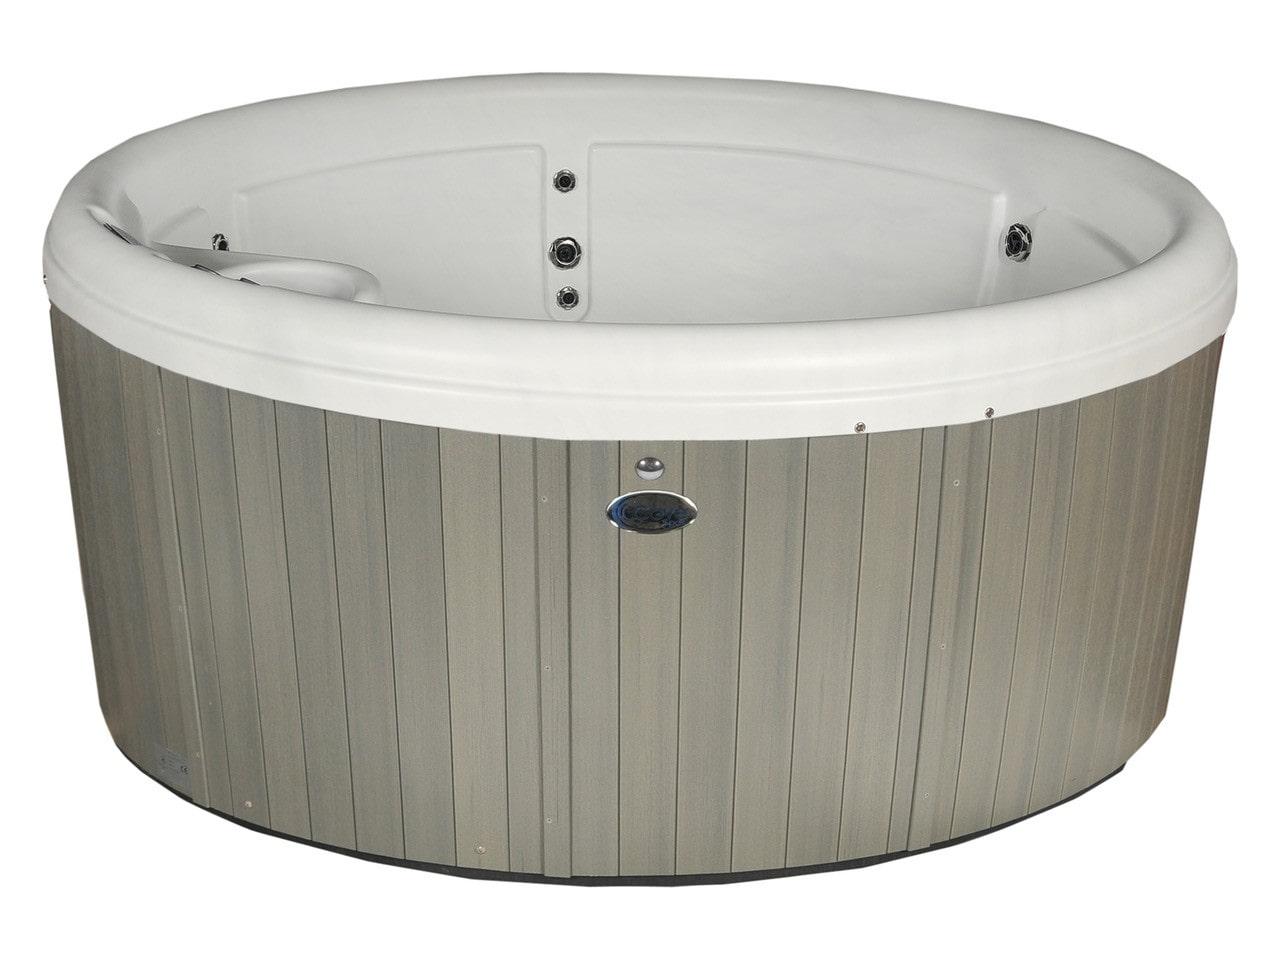 Compact holiday home hot tub